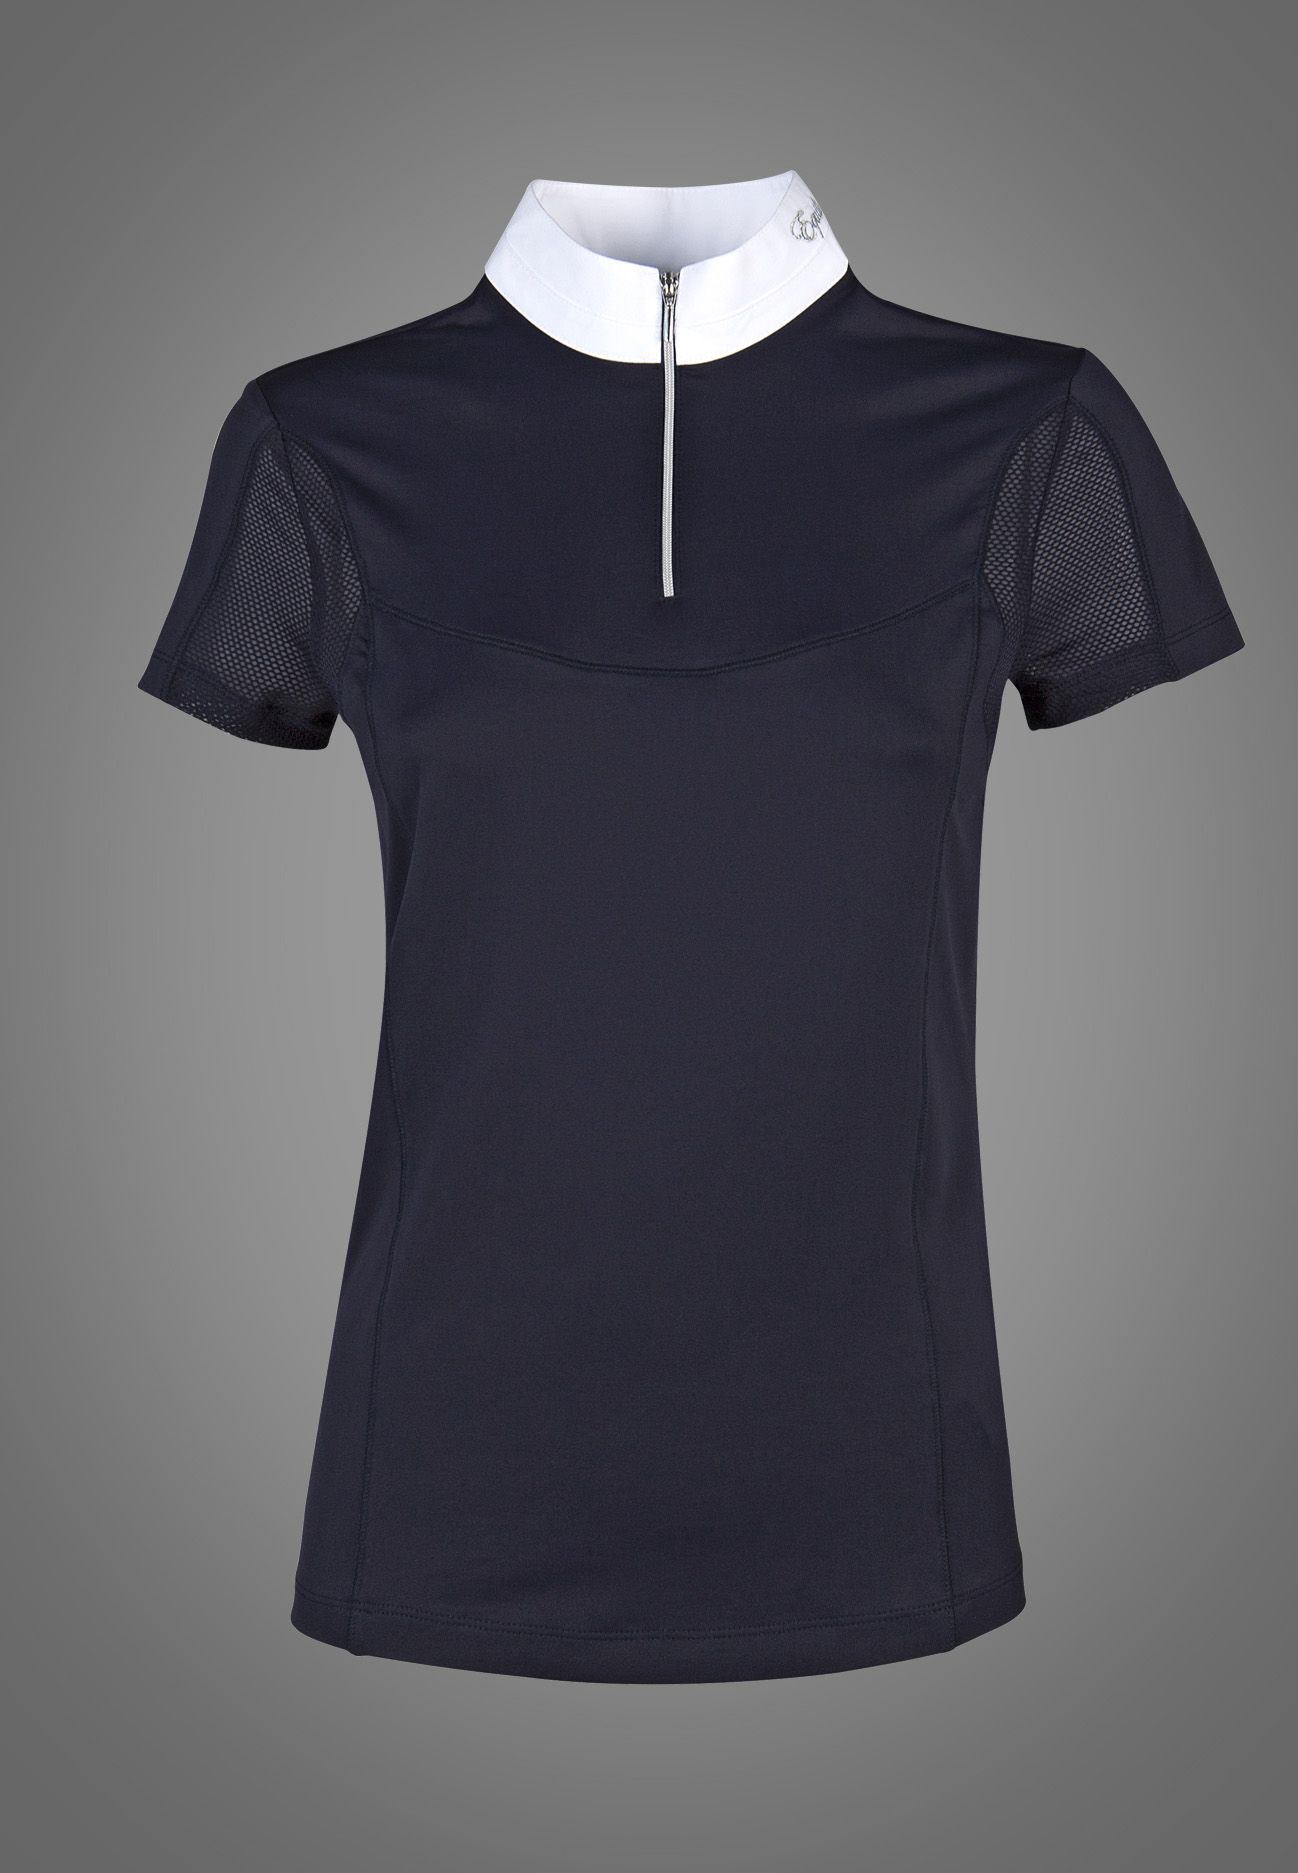 Briony Woman Polo Shirt Spring Summer 2017 Equestrian Wear